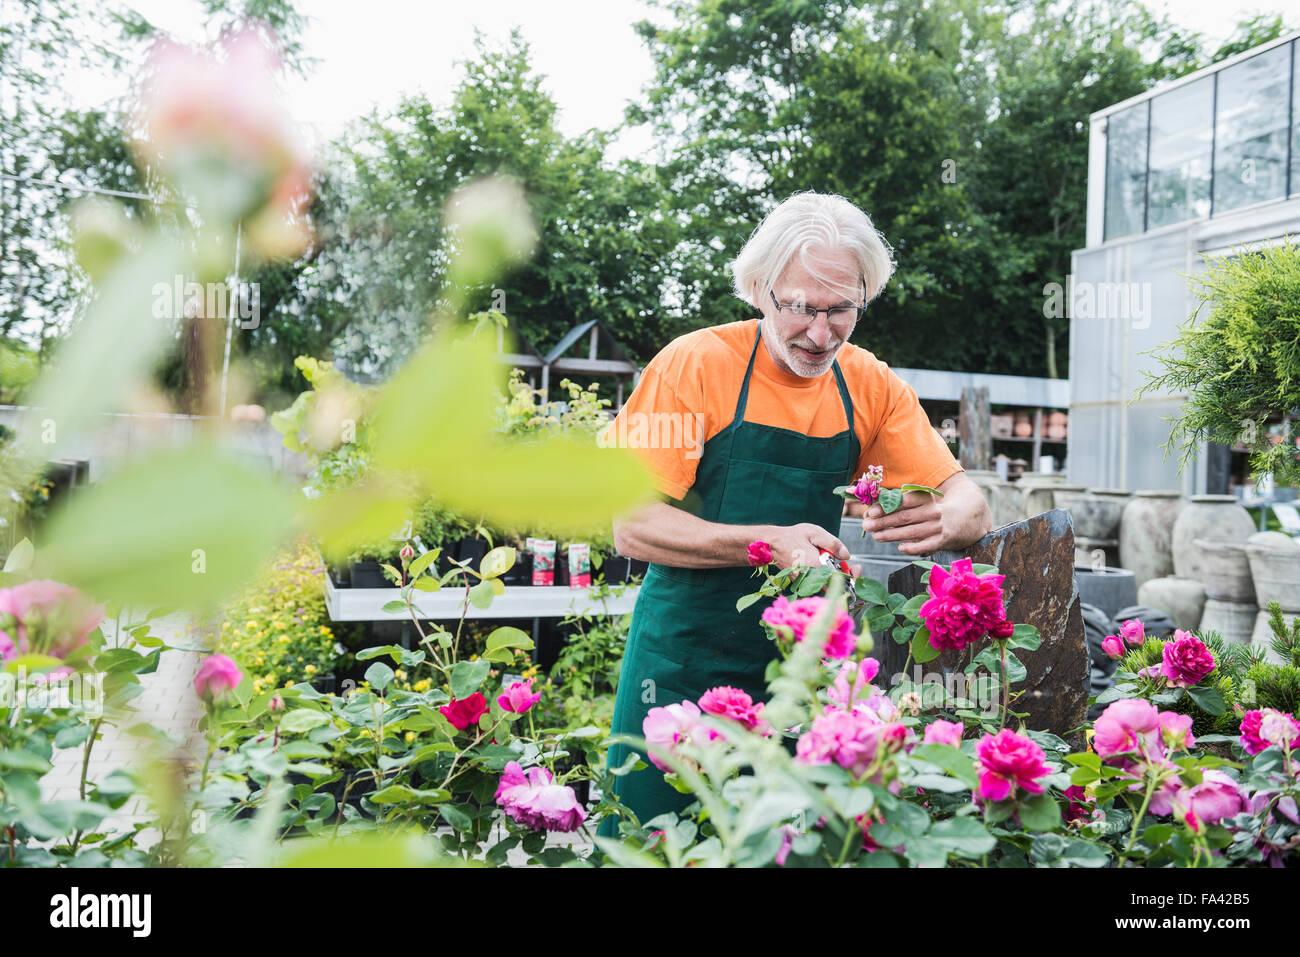 Male gardener trimming roses in greenhouse, Augsburg, Bavaria, Germany - Stock Image